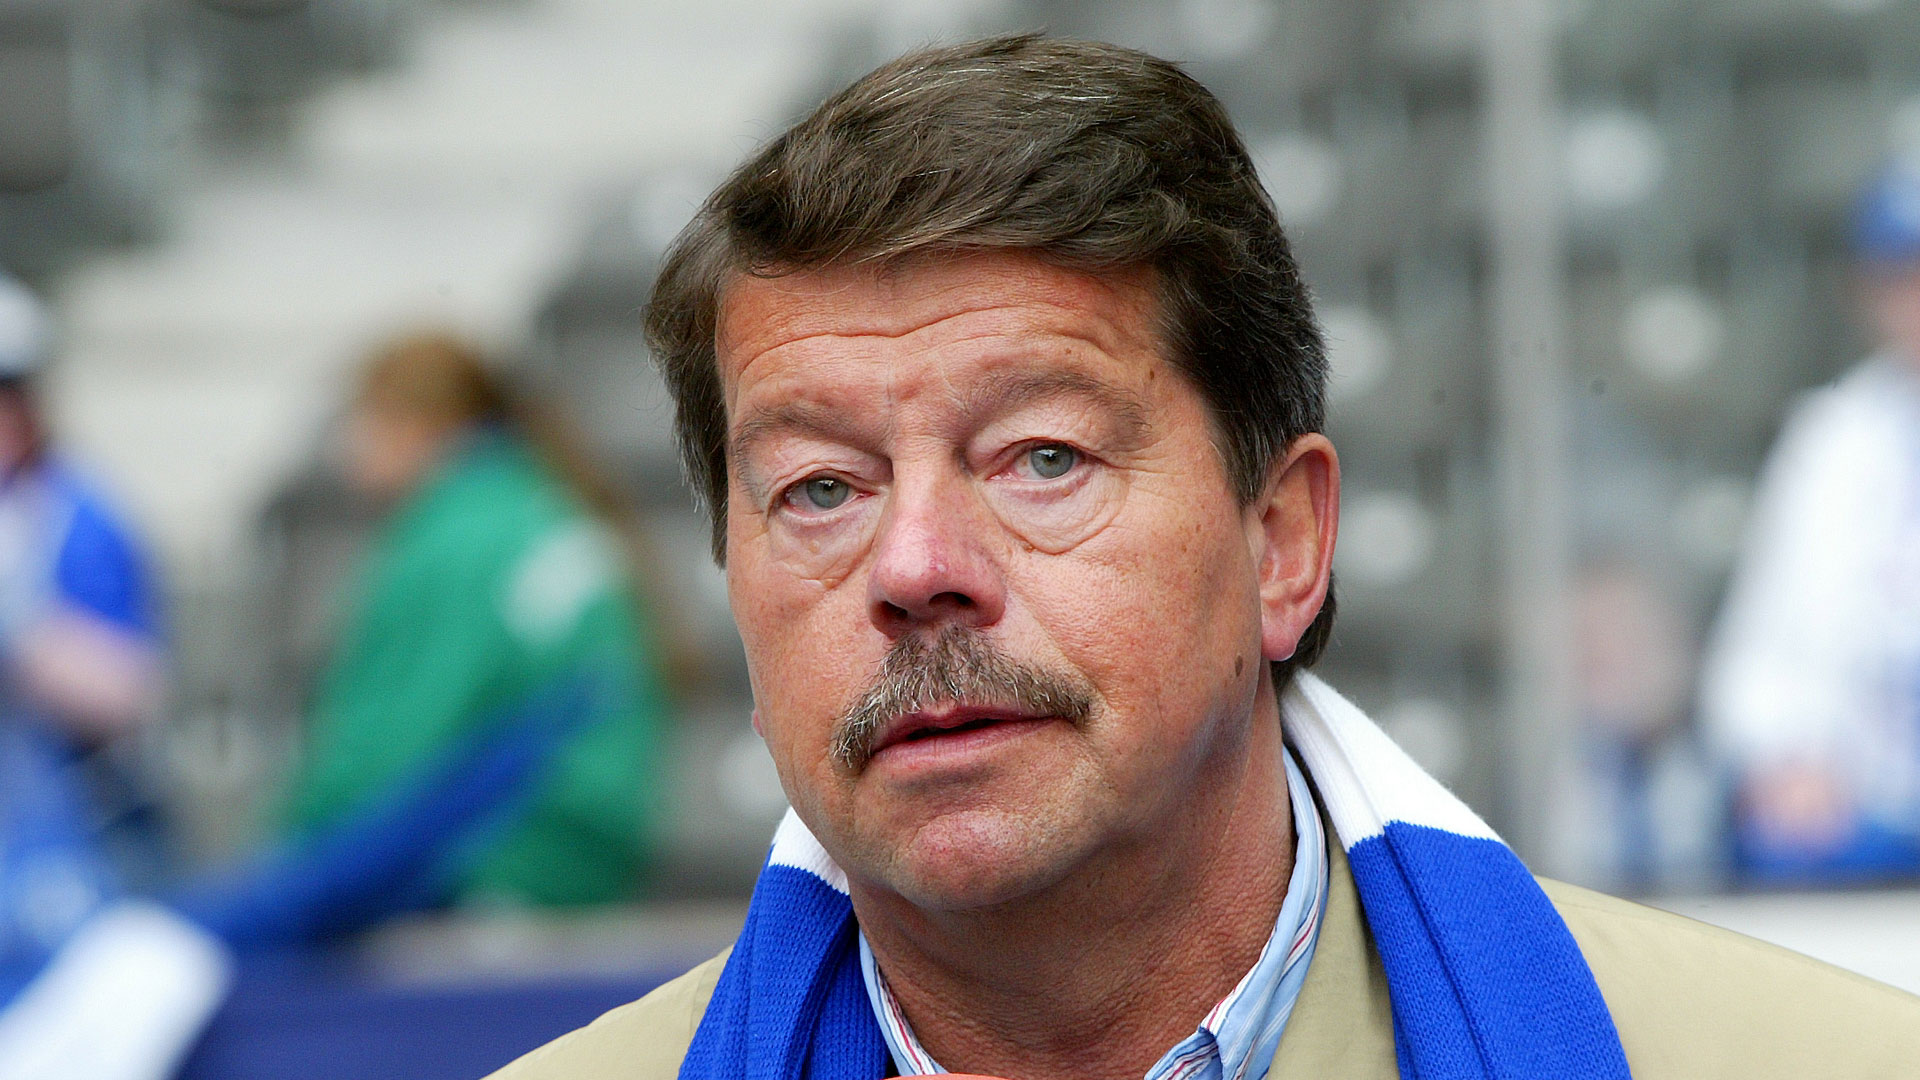 Bernd Schiphorst